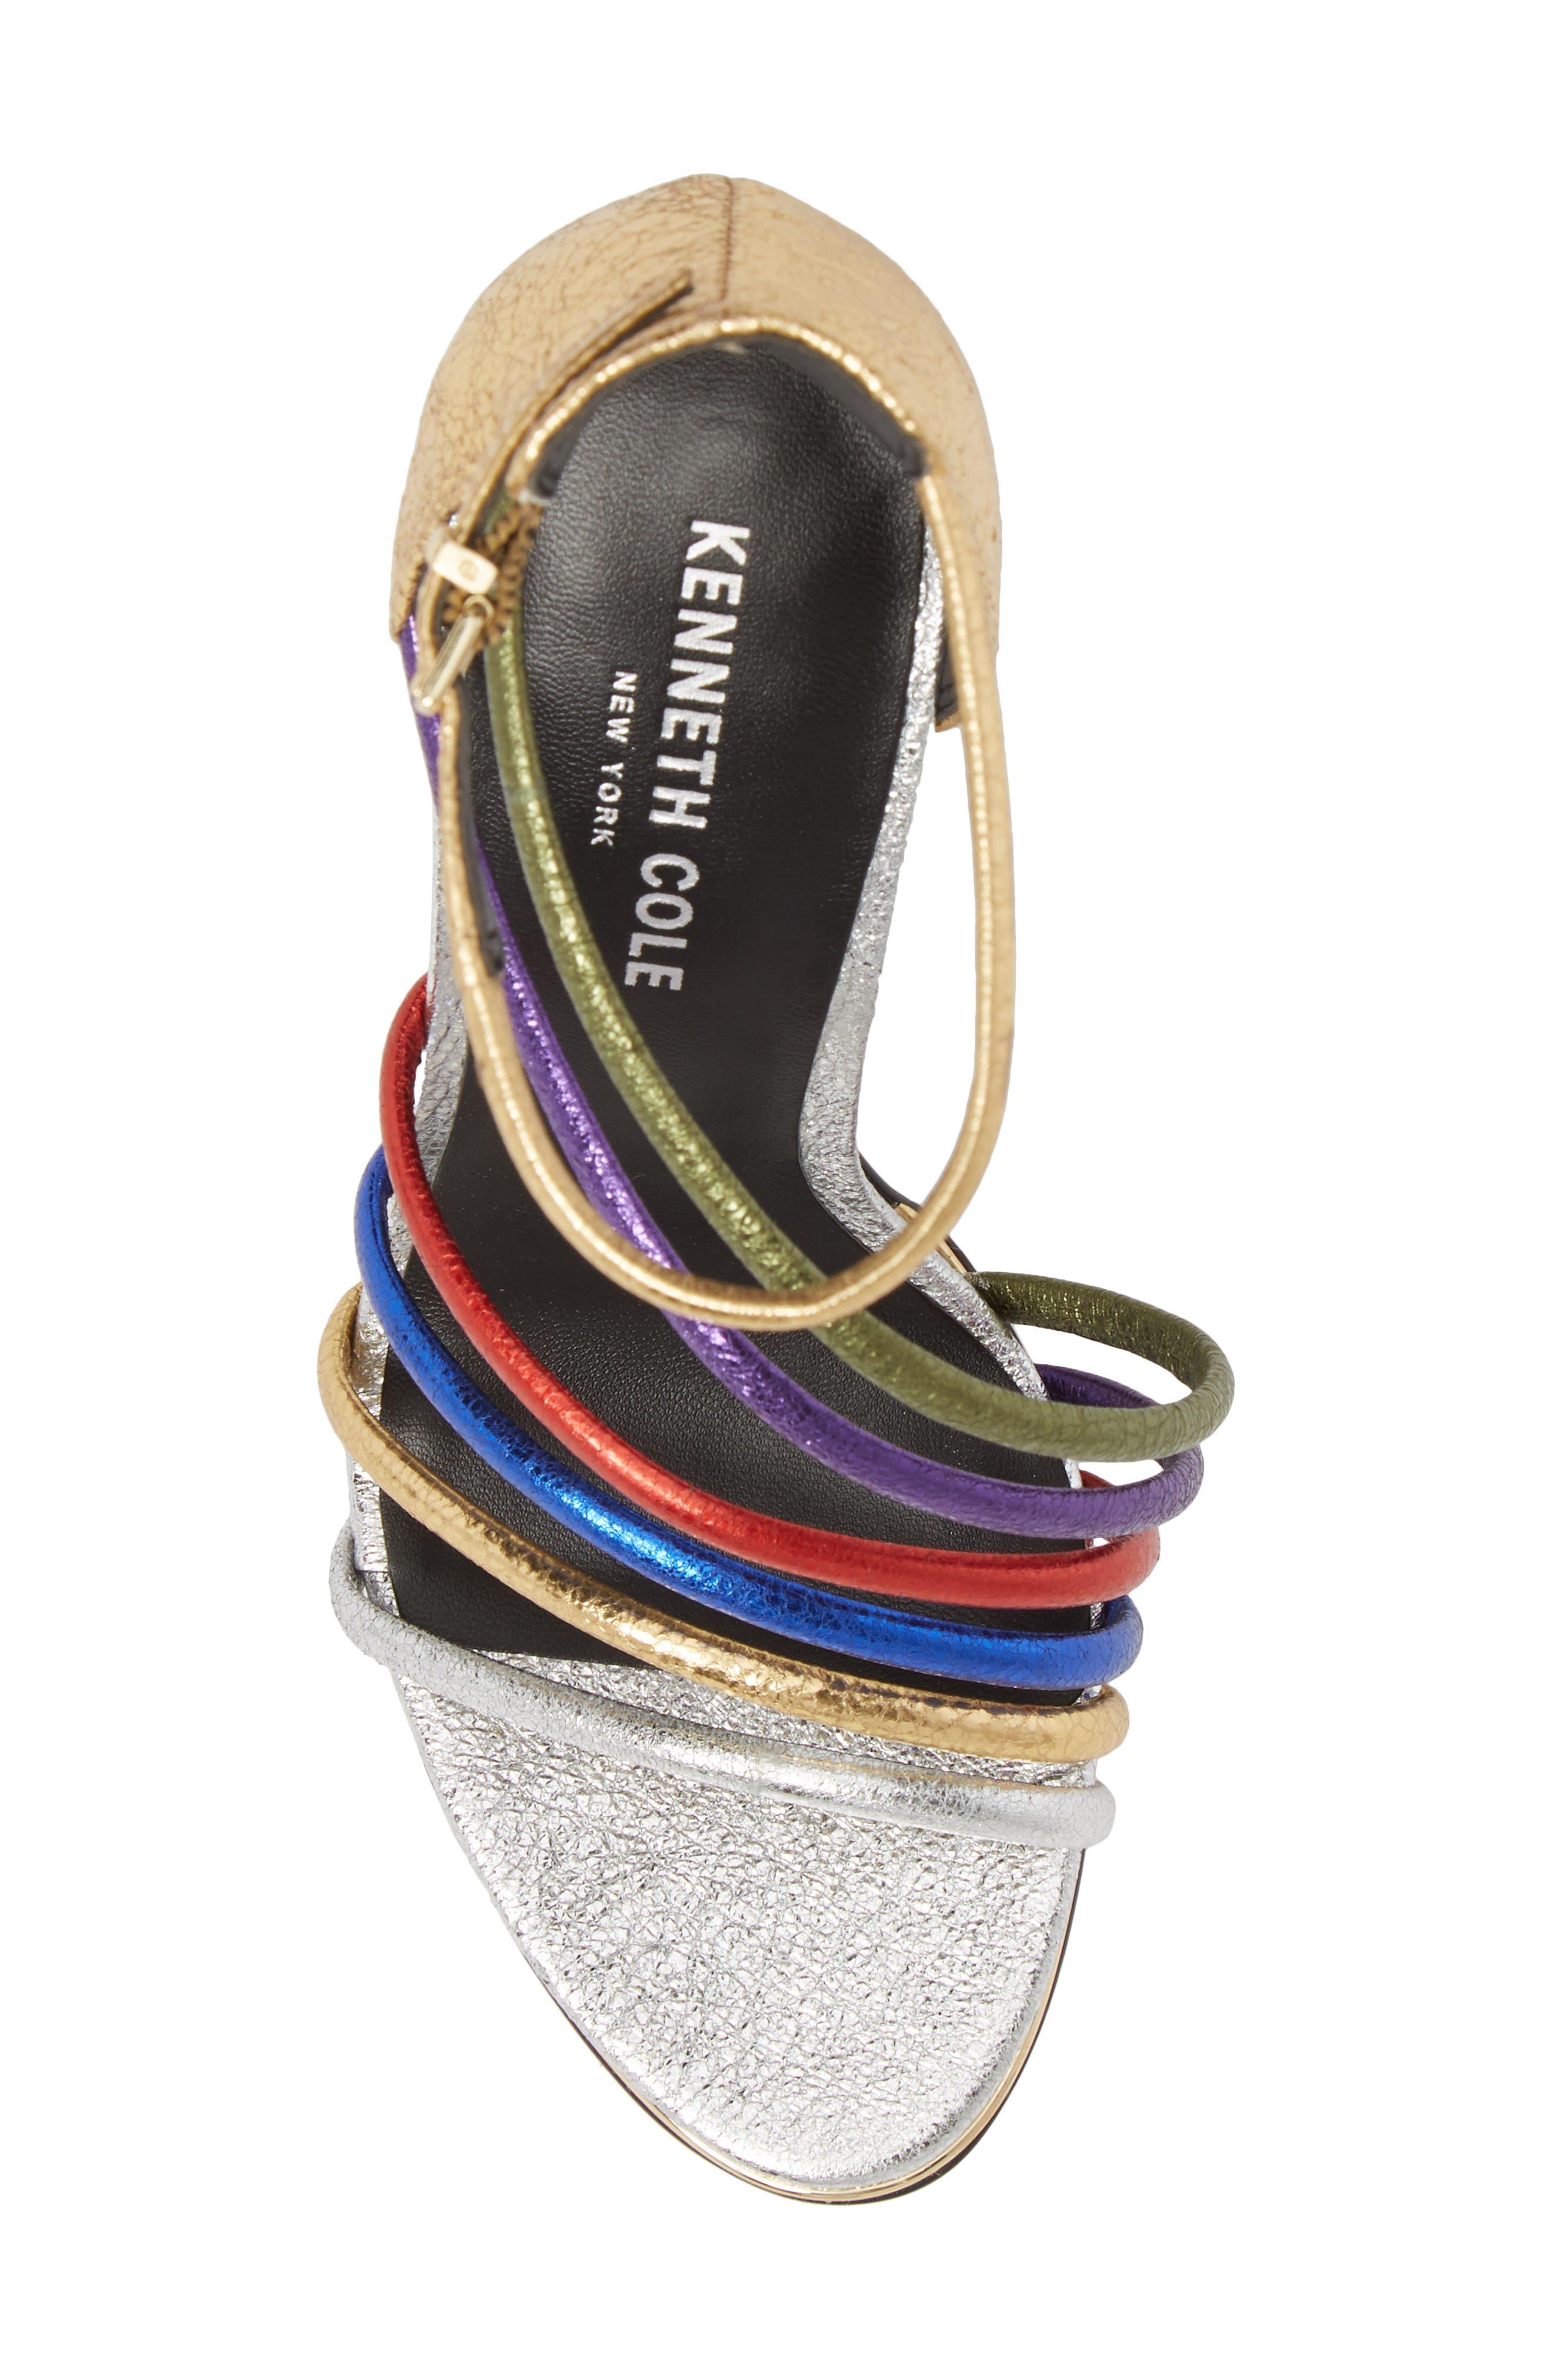 Barletta Asymmetrical Strappy Sandal,                             Alternate thumbnail 5, color,                             MULTI LEATHER